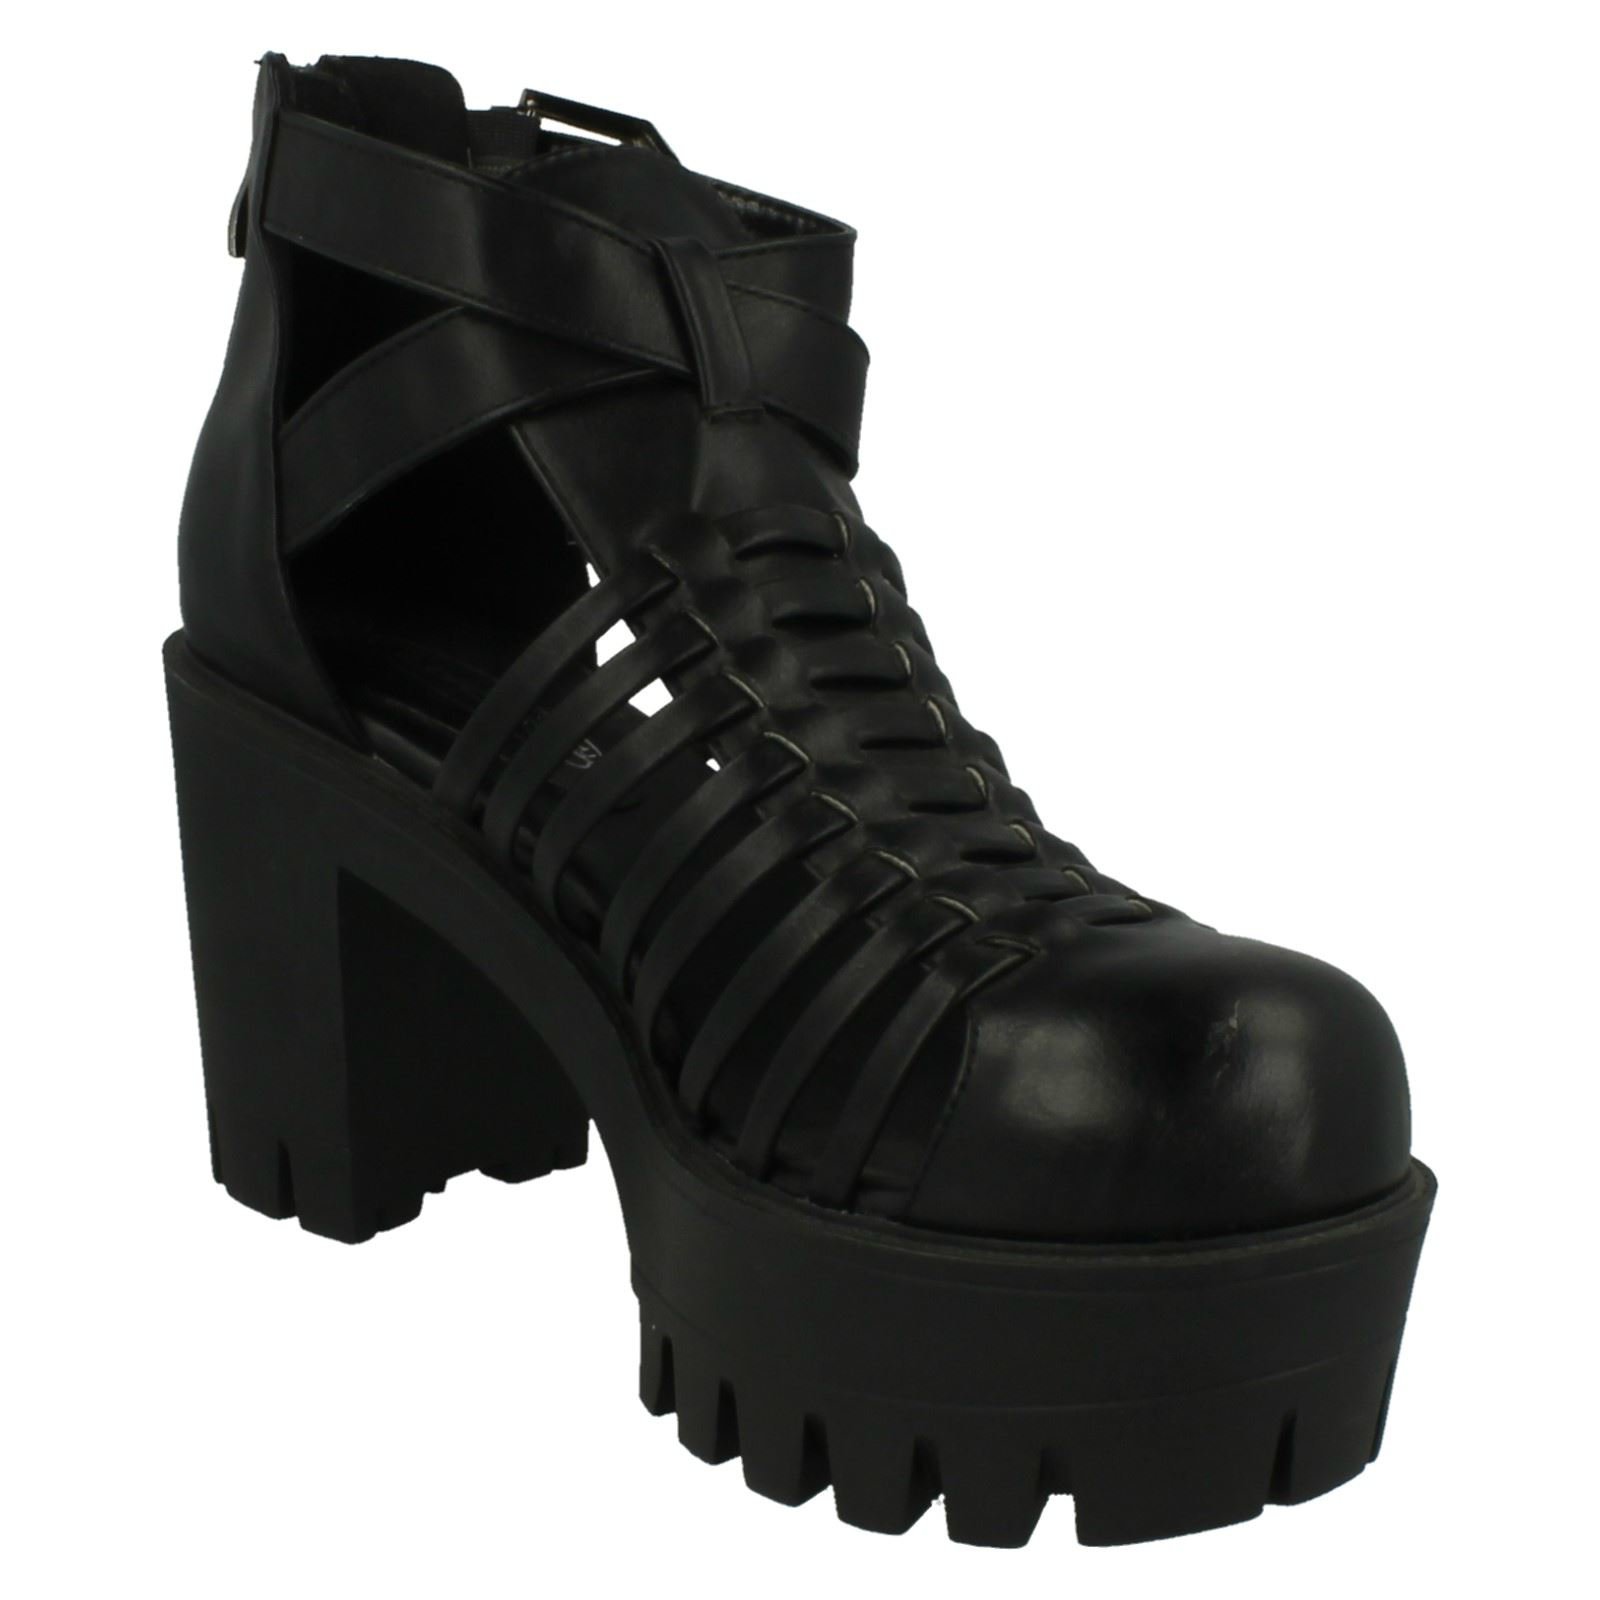 Zapatos señoras de punto en grueso talón